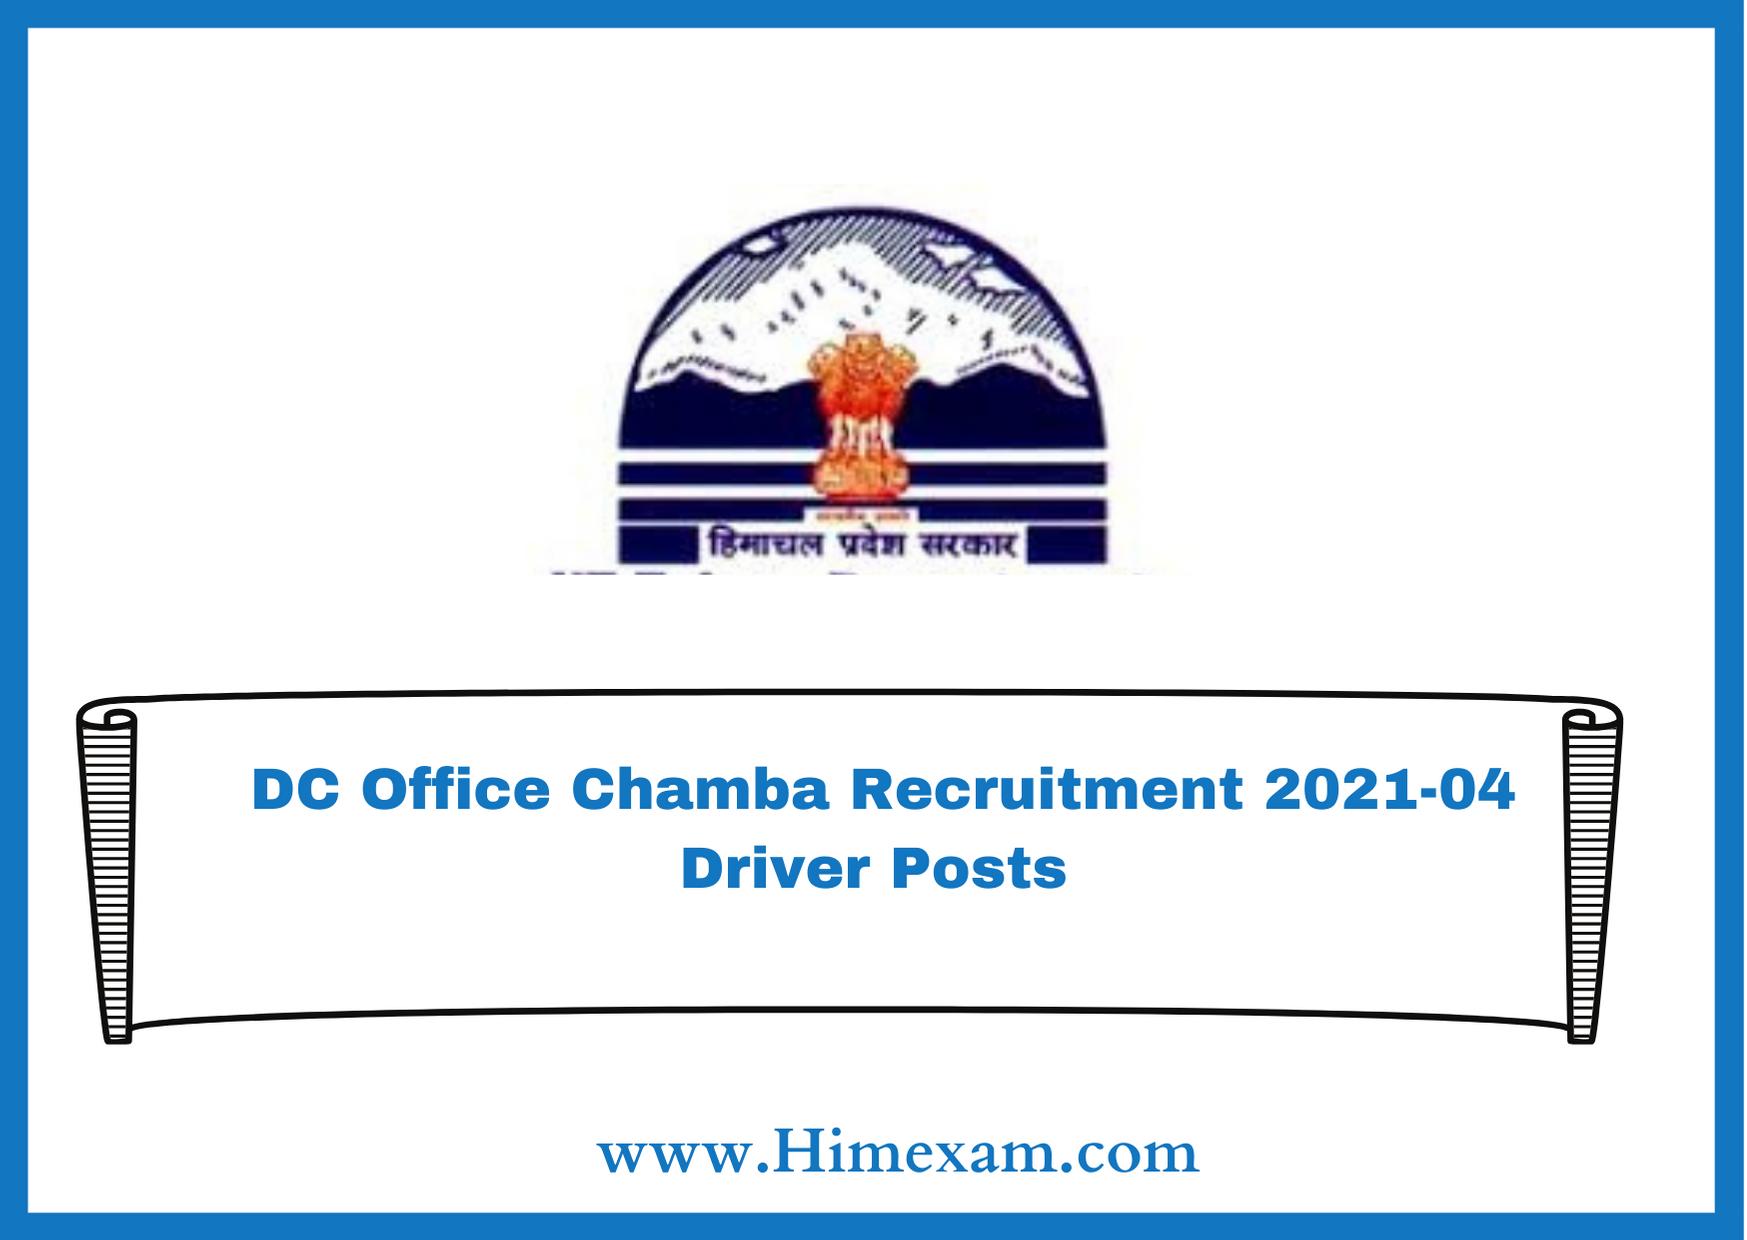 DC Office Chamba Recruitment 2021-04 Driver Posts